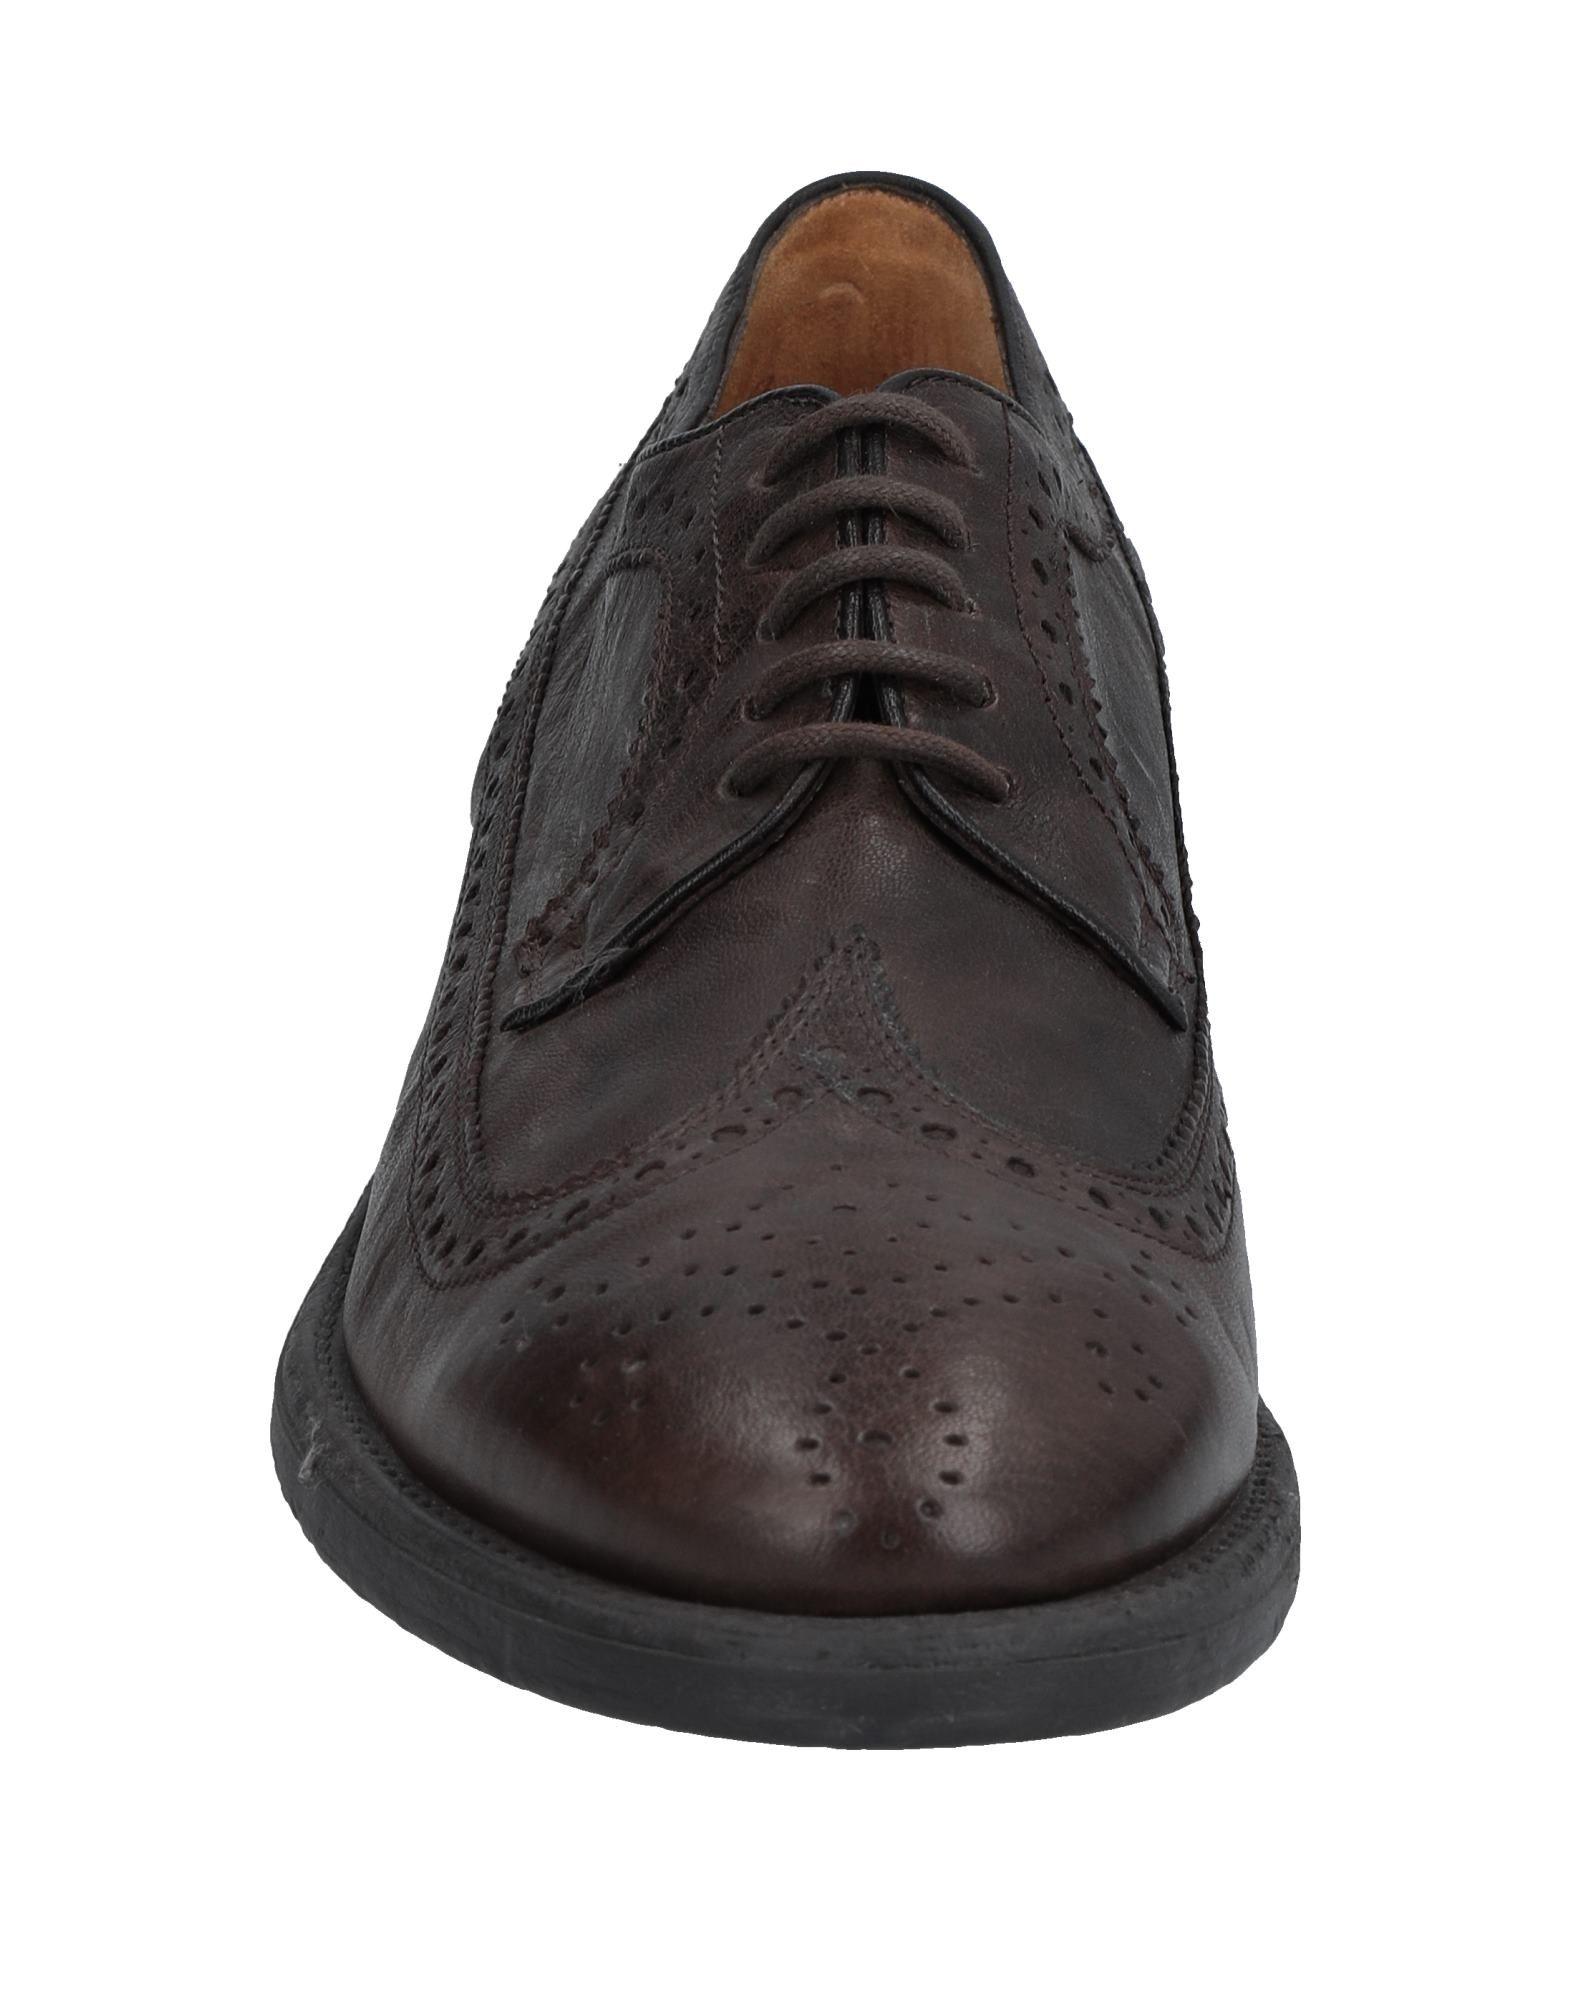 Rabatt Anderson echte Schuhe Anderson Rabatt Schnürschuhe Herren  11521662MC 6bd44a